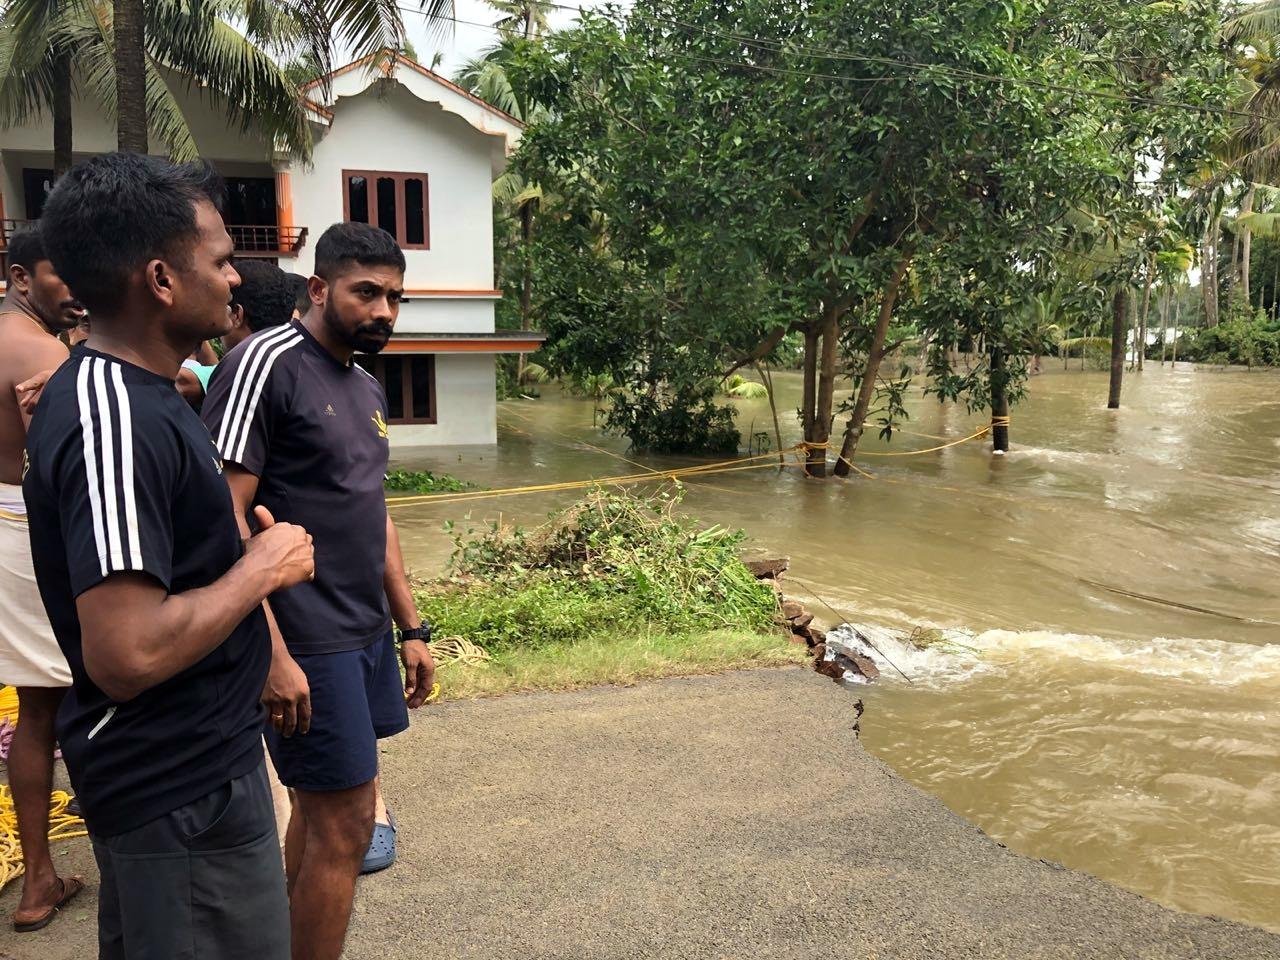 kerala flood 2018 images update 11